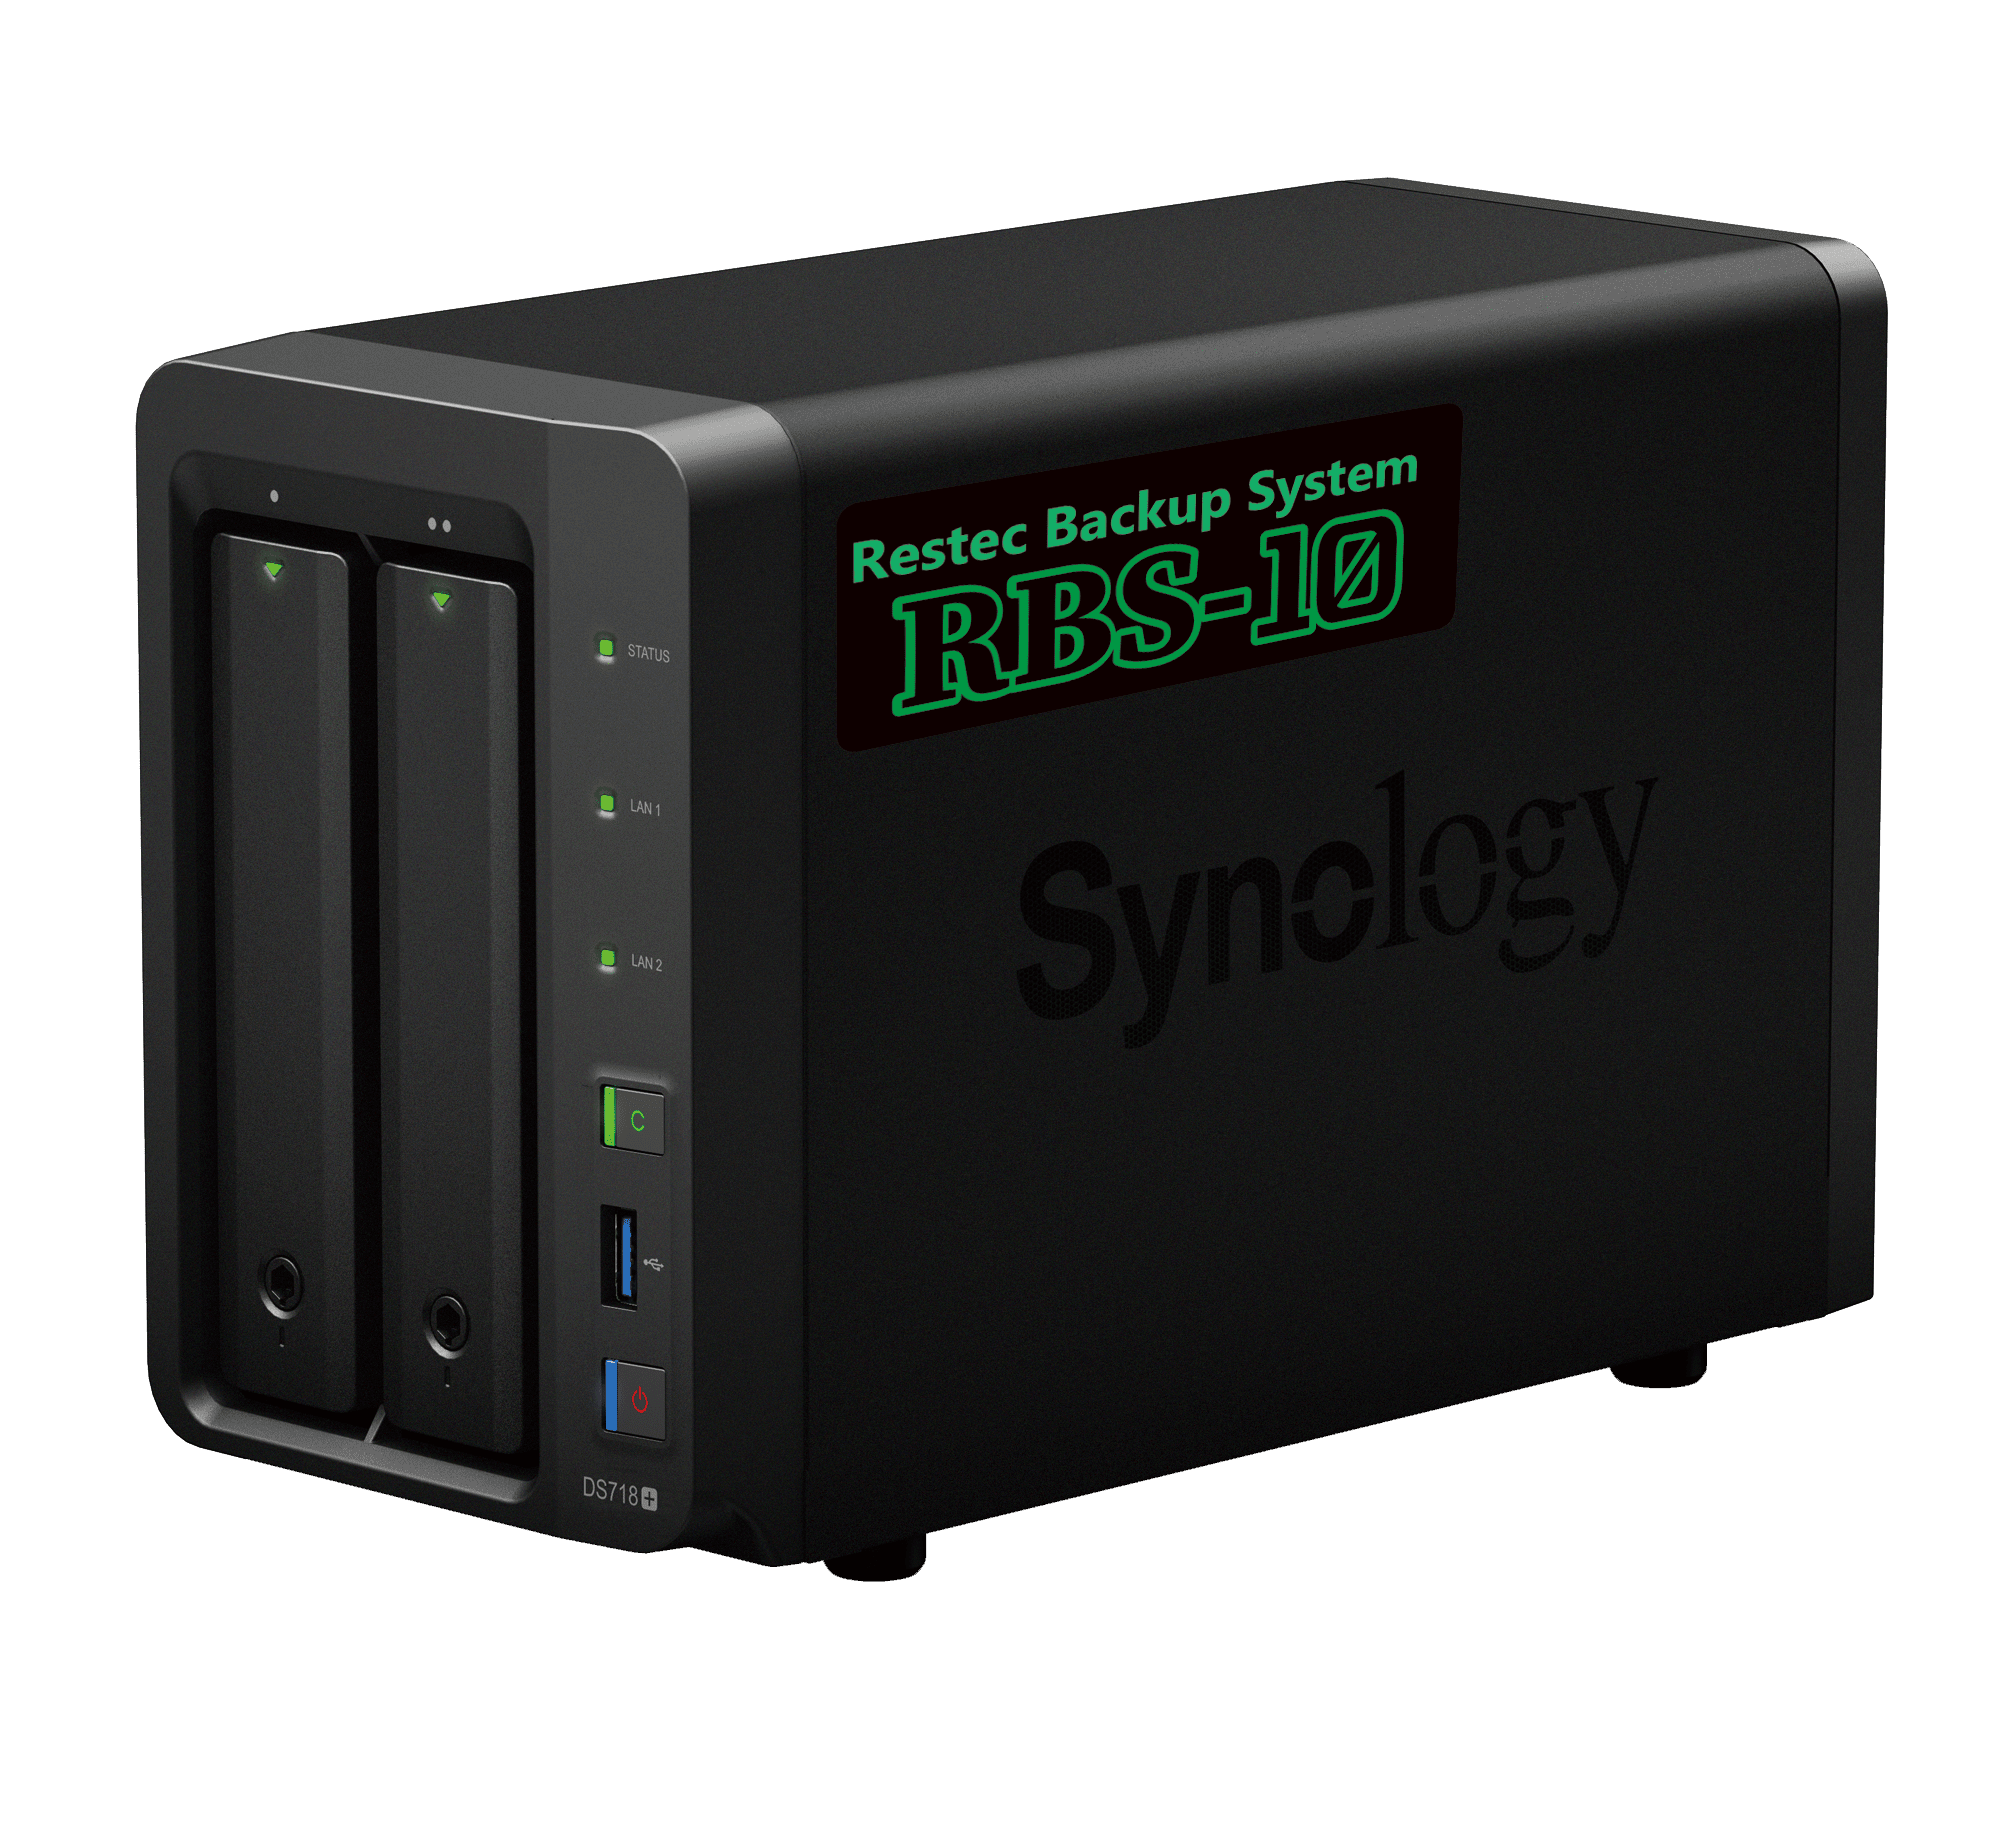 Restec Backup System RBS-10